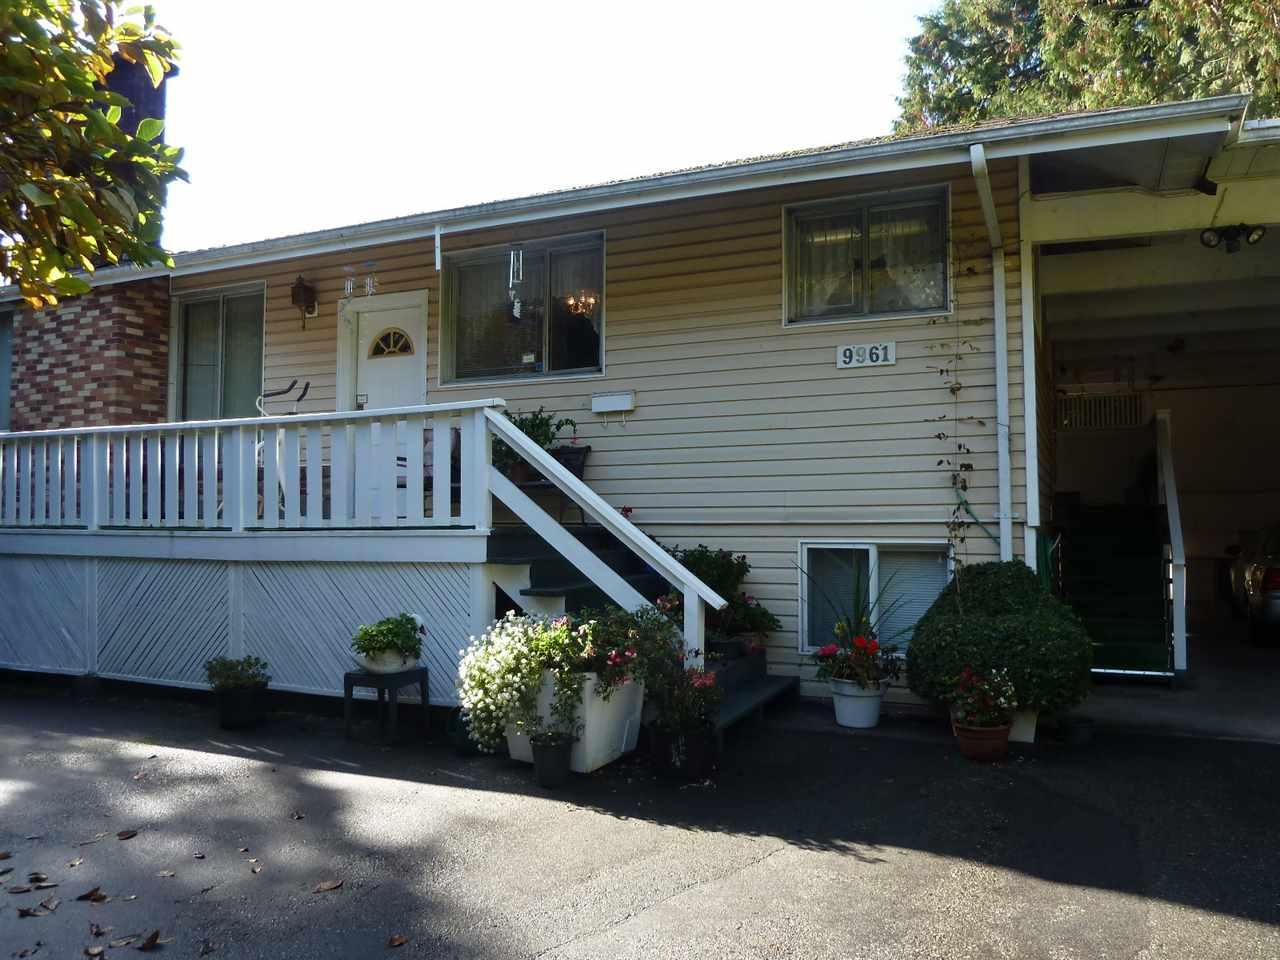 Detached at 9961 140 STREET, North Surrey, British Columbia. Image 1